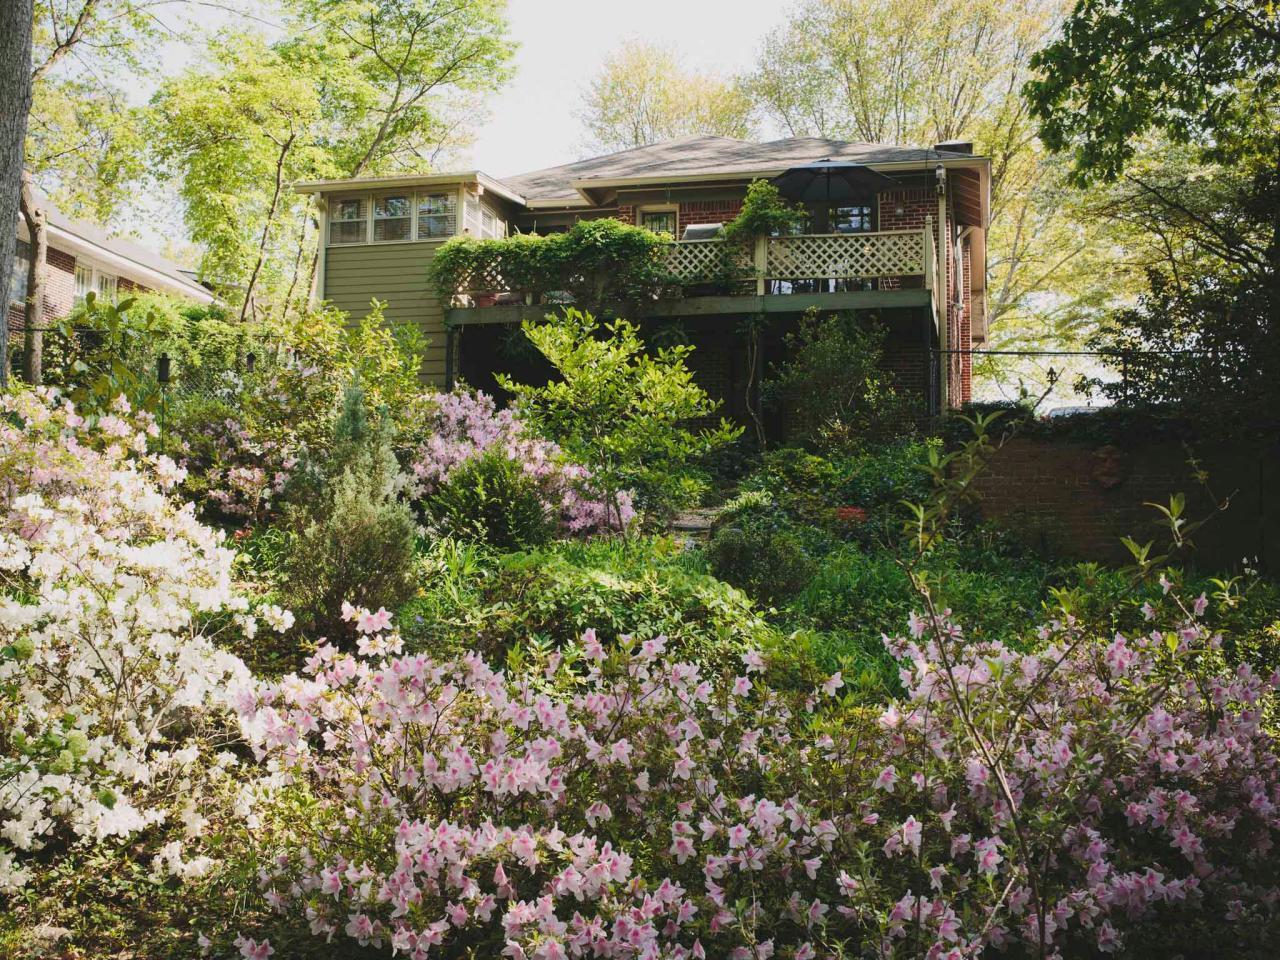 Hillside Landscaping Ideas | HGTV on Hill Backyard Ideas id=21873